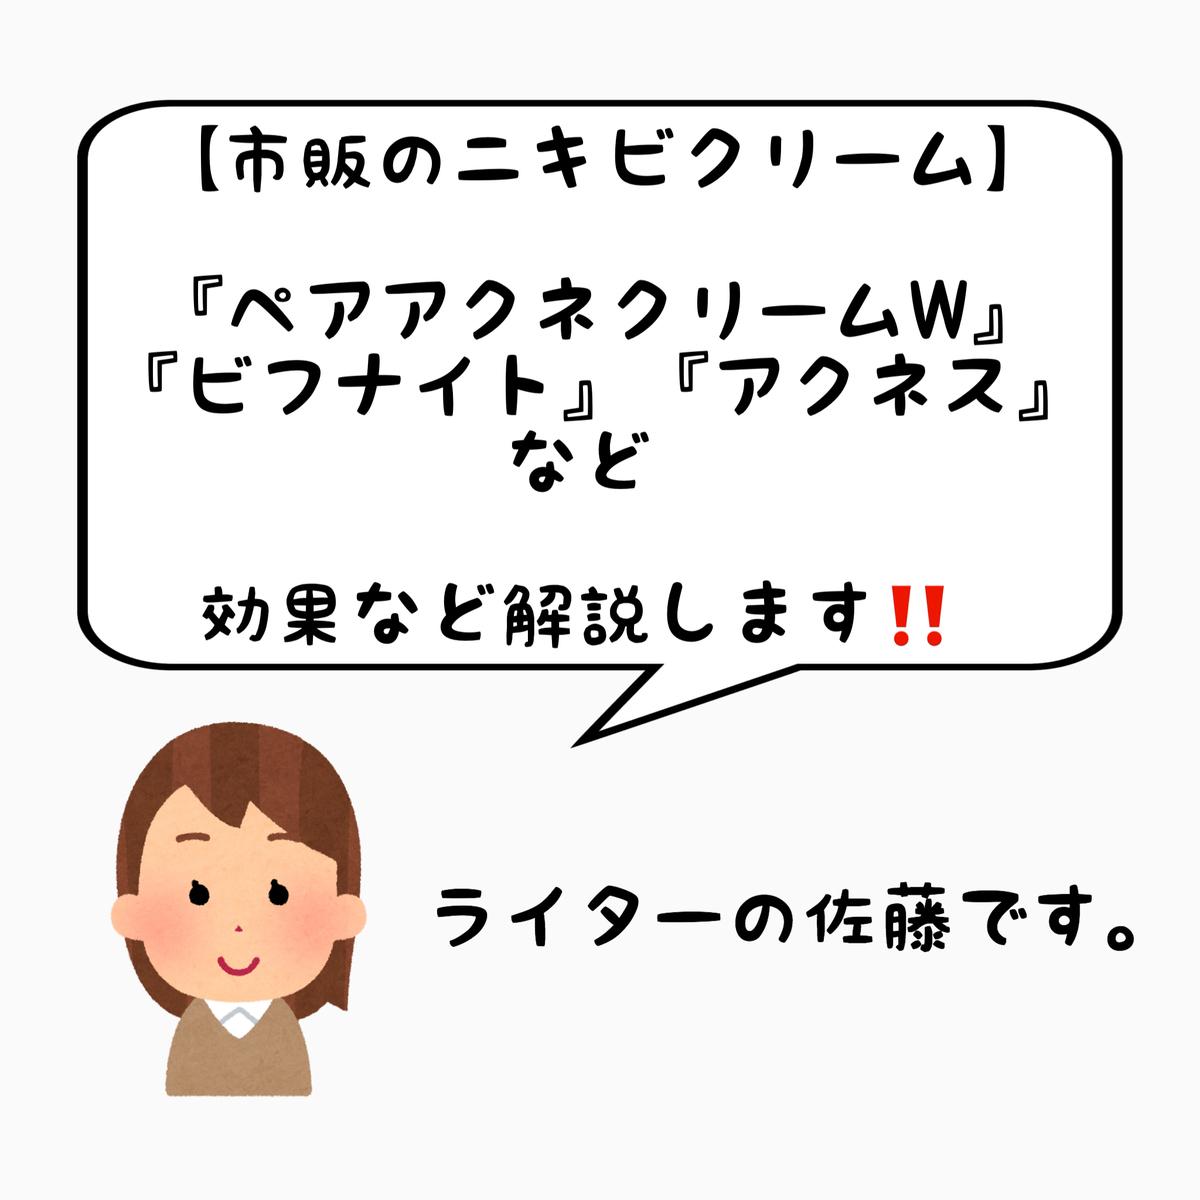 f:id:nokonoko_o:20201212180421j:plain